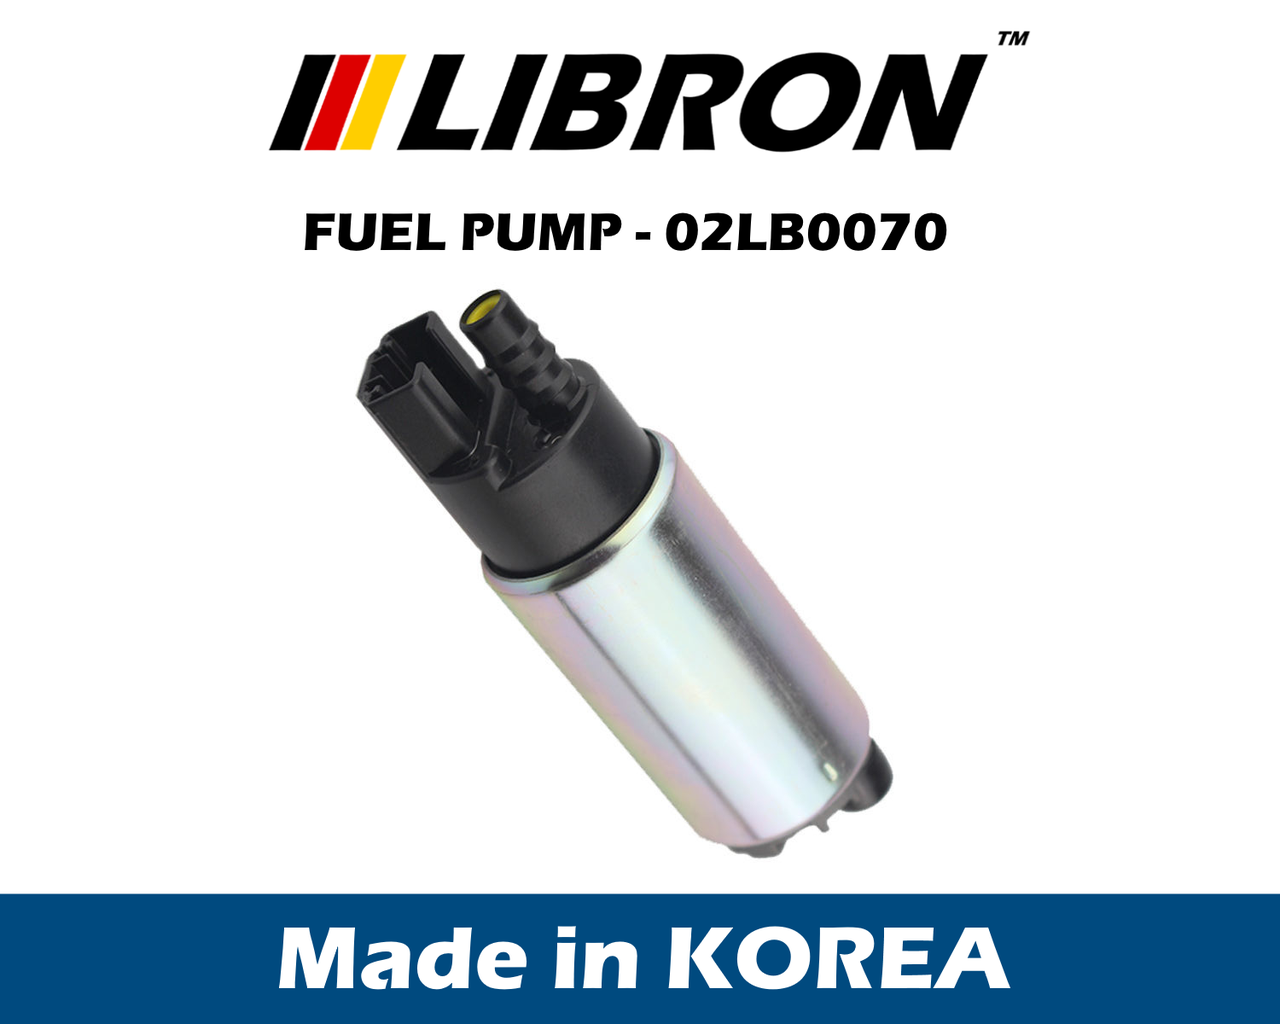 Топливный насос LIBRON 02LB0070 - MITSUBISHI SPACE RUNNER (1991-1999)